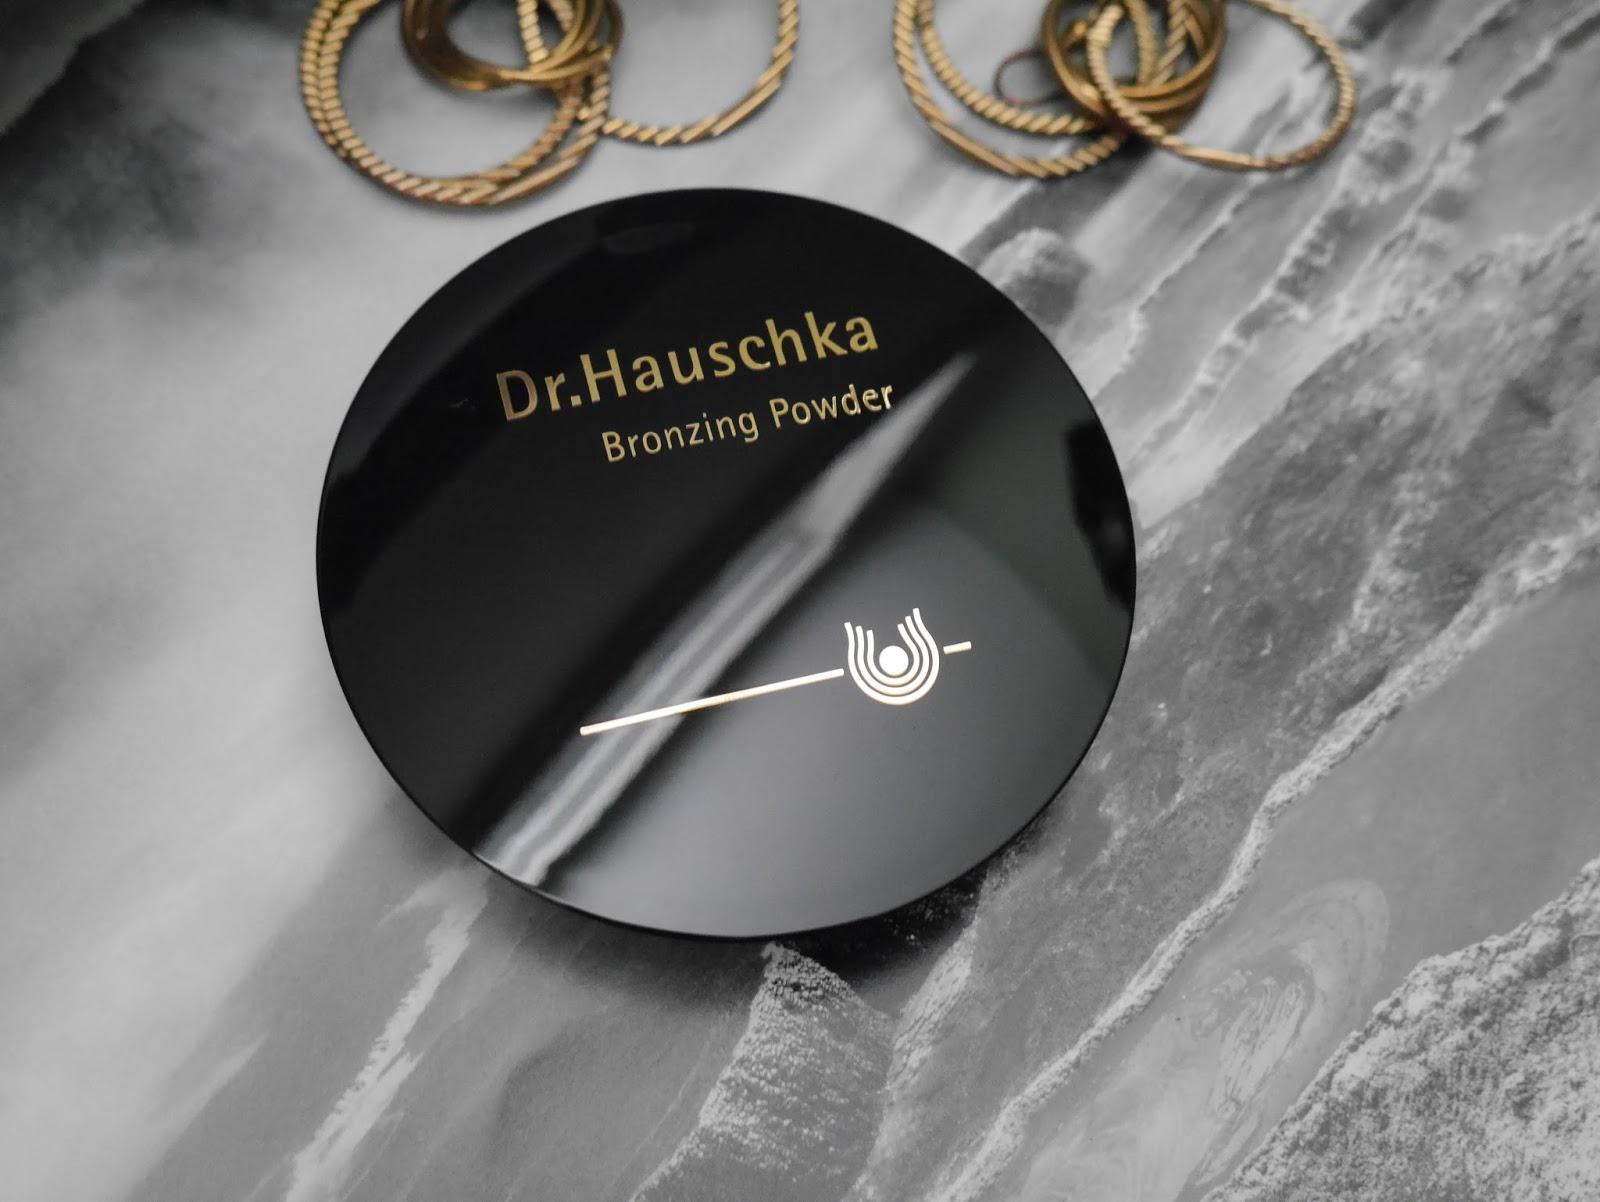 review dr hauschka bronzing powder reflection of sanity. Black Bedroom Furniture Sets. Home Design Ideas